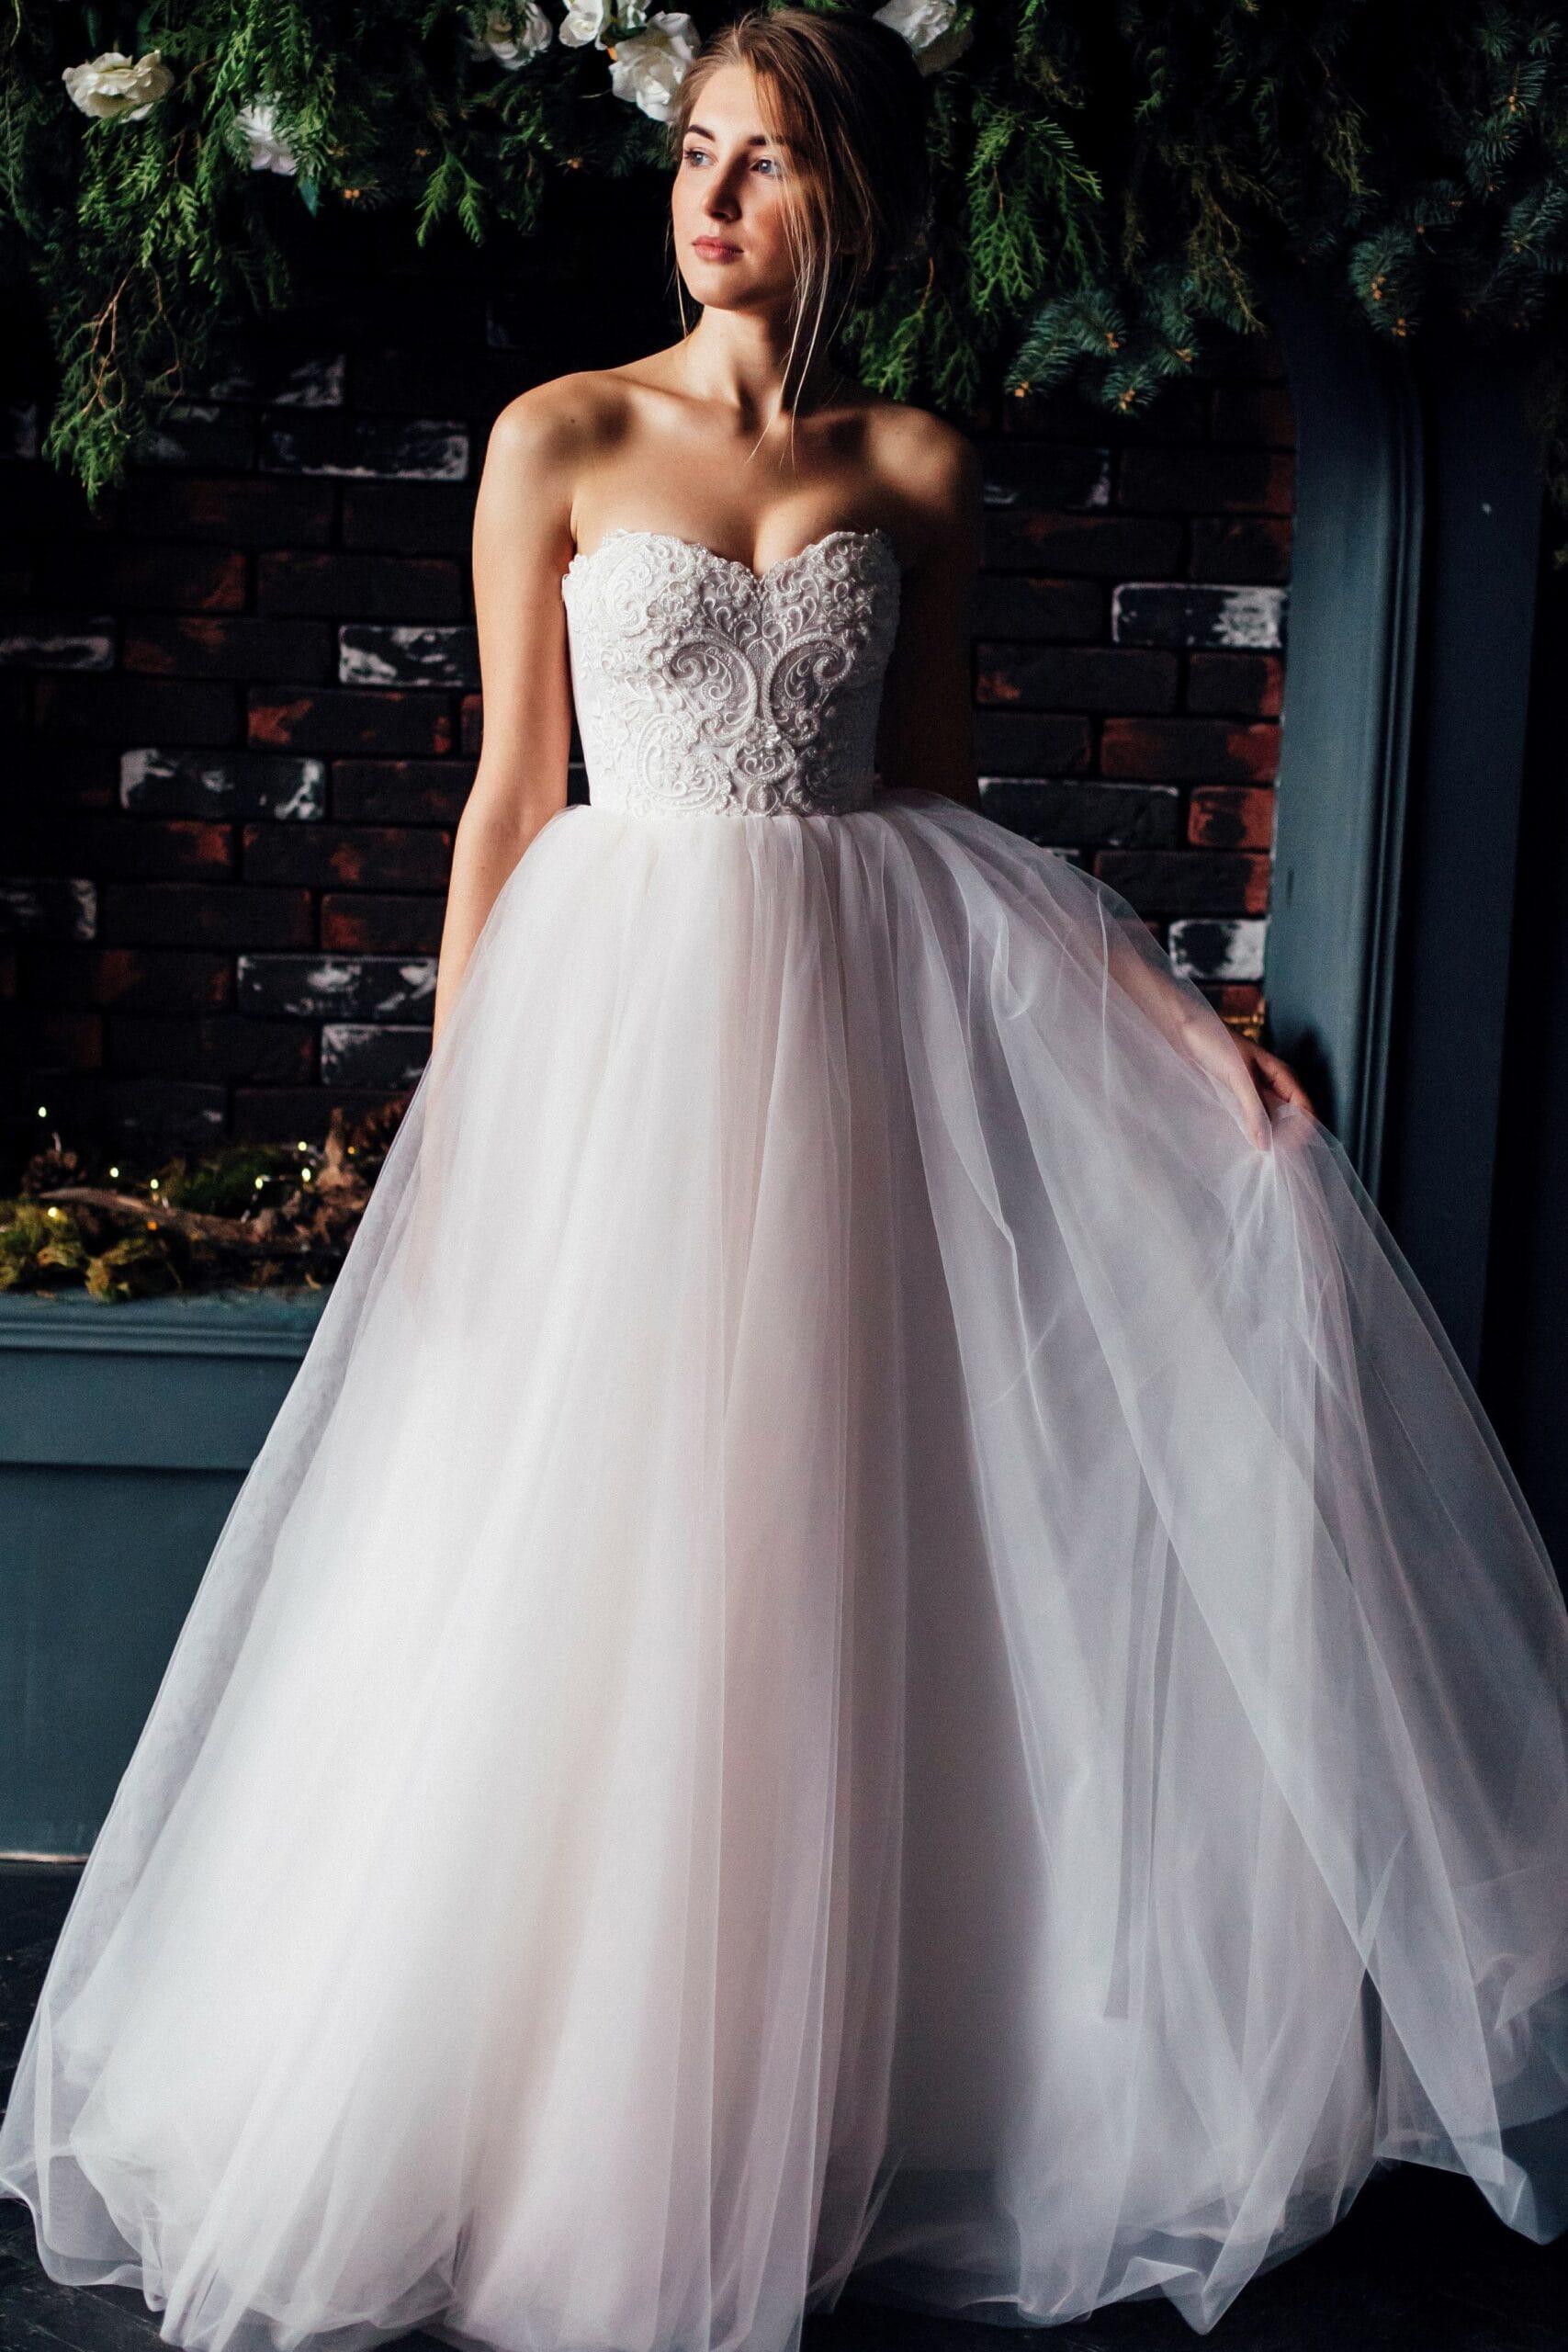 Свадебное платье VANESSA, коллекция THE ABSOLUTE LOVE, бренд RARE BRIDAL, фото 2